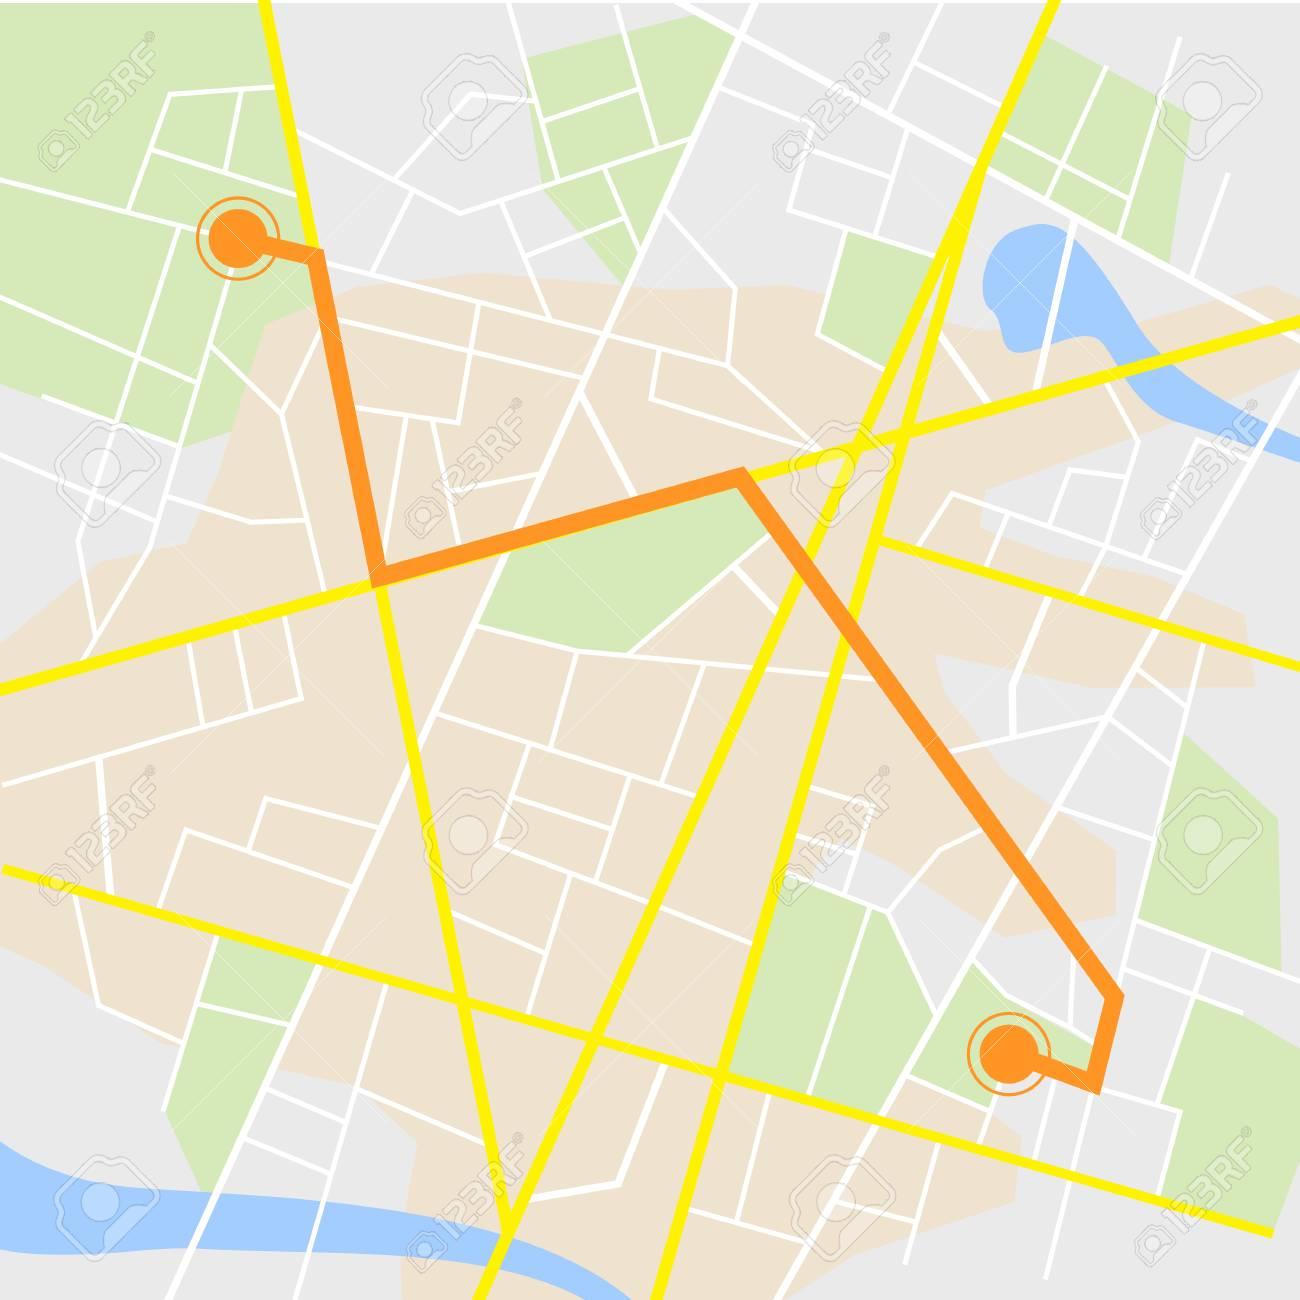 Gps Road Map Gps Navigation Background. Road Map, Vector Illustration Royalty  Gps Road Map